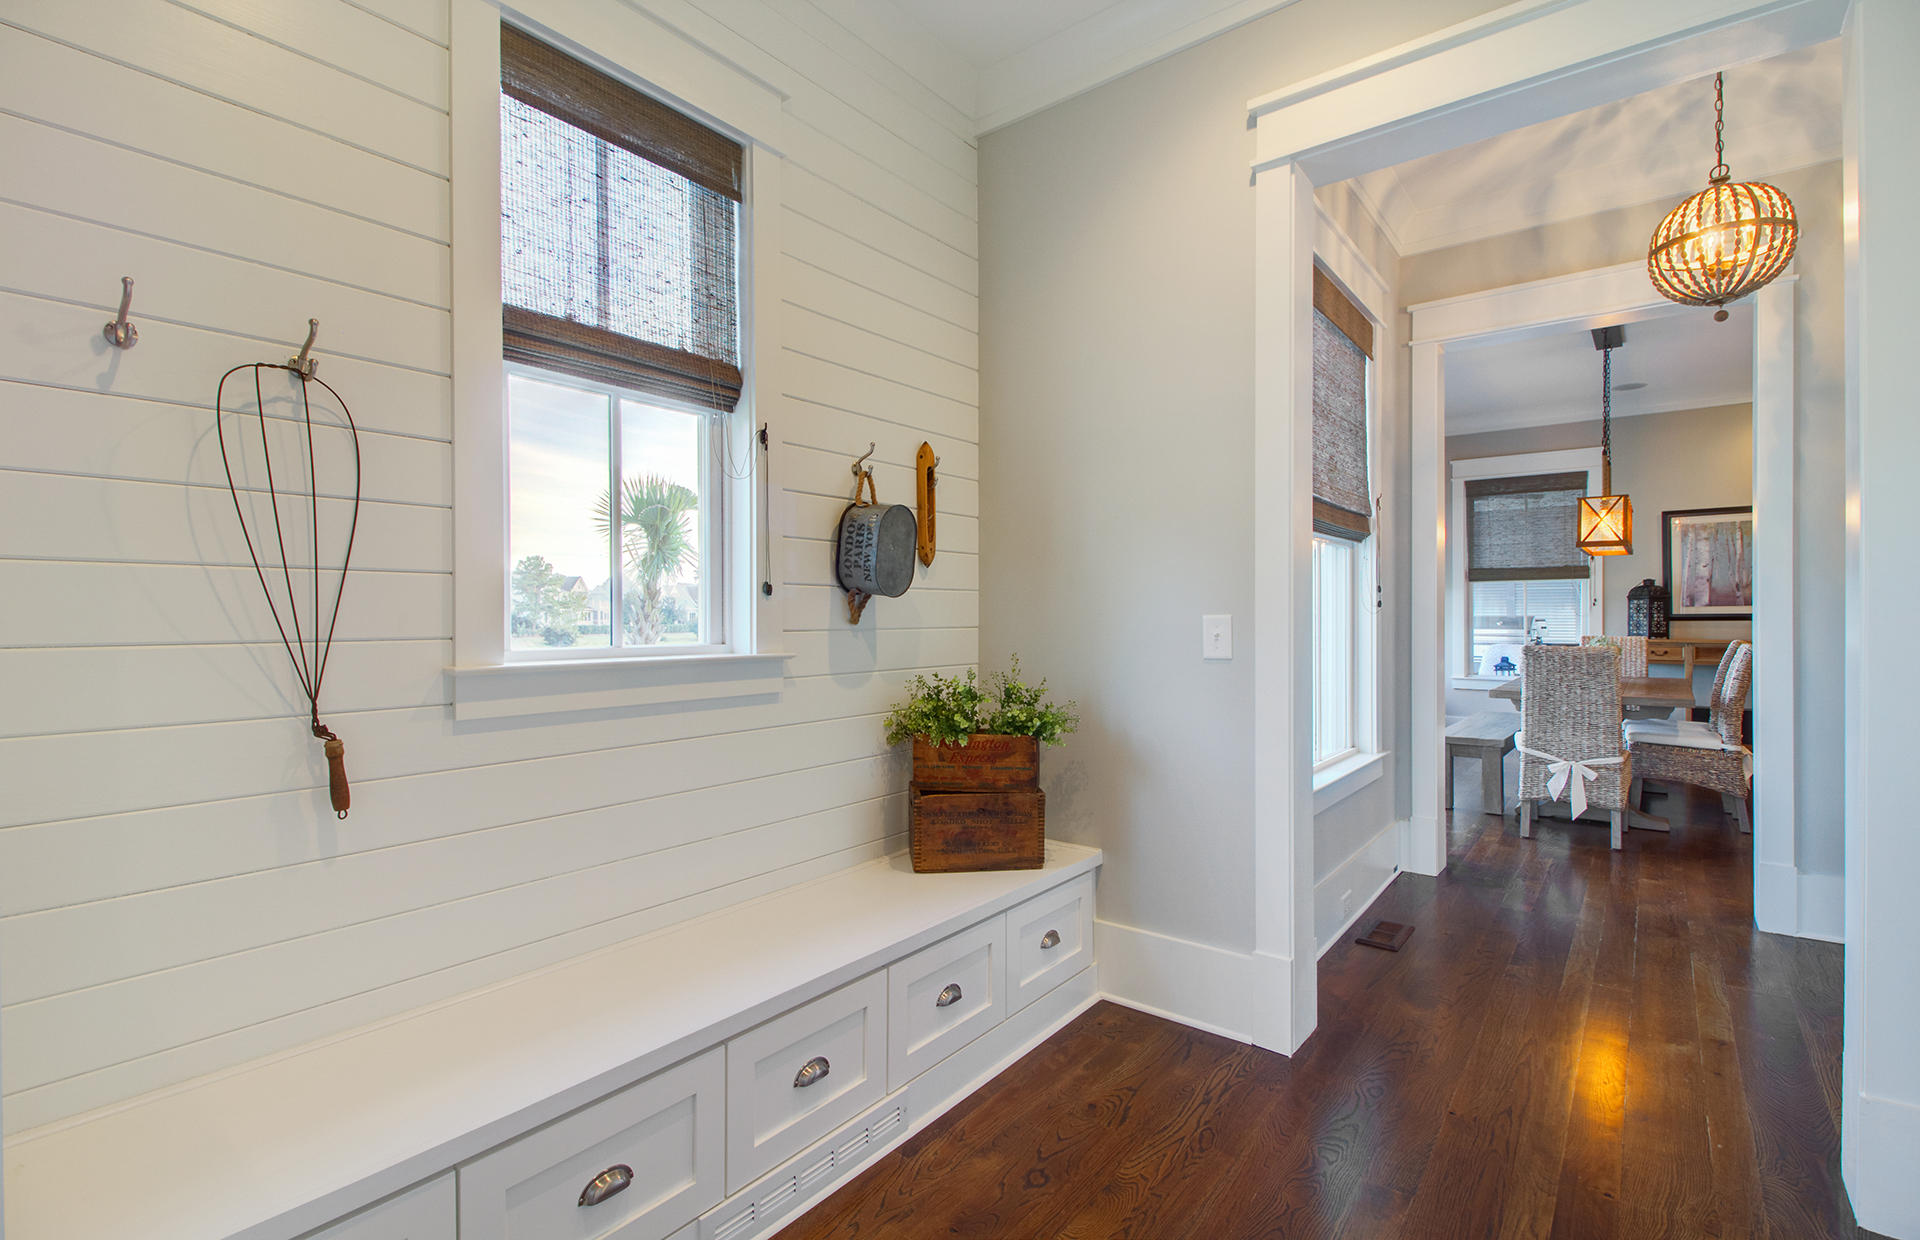 Daniel Island Park Homes For Sale - 117 Brailsford, Charleston, SC - 2